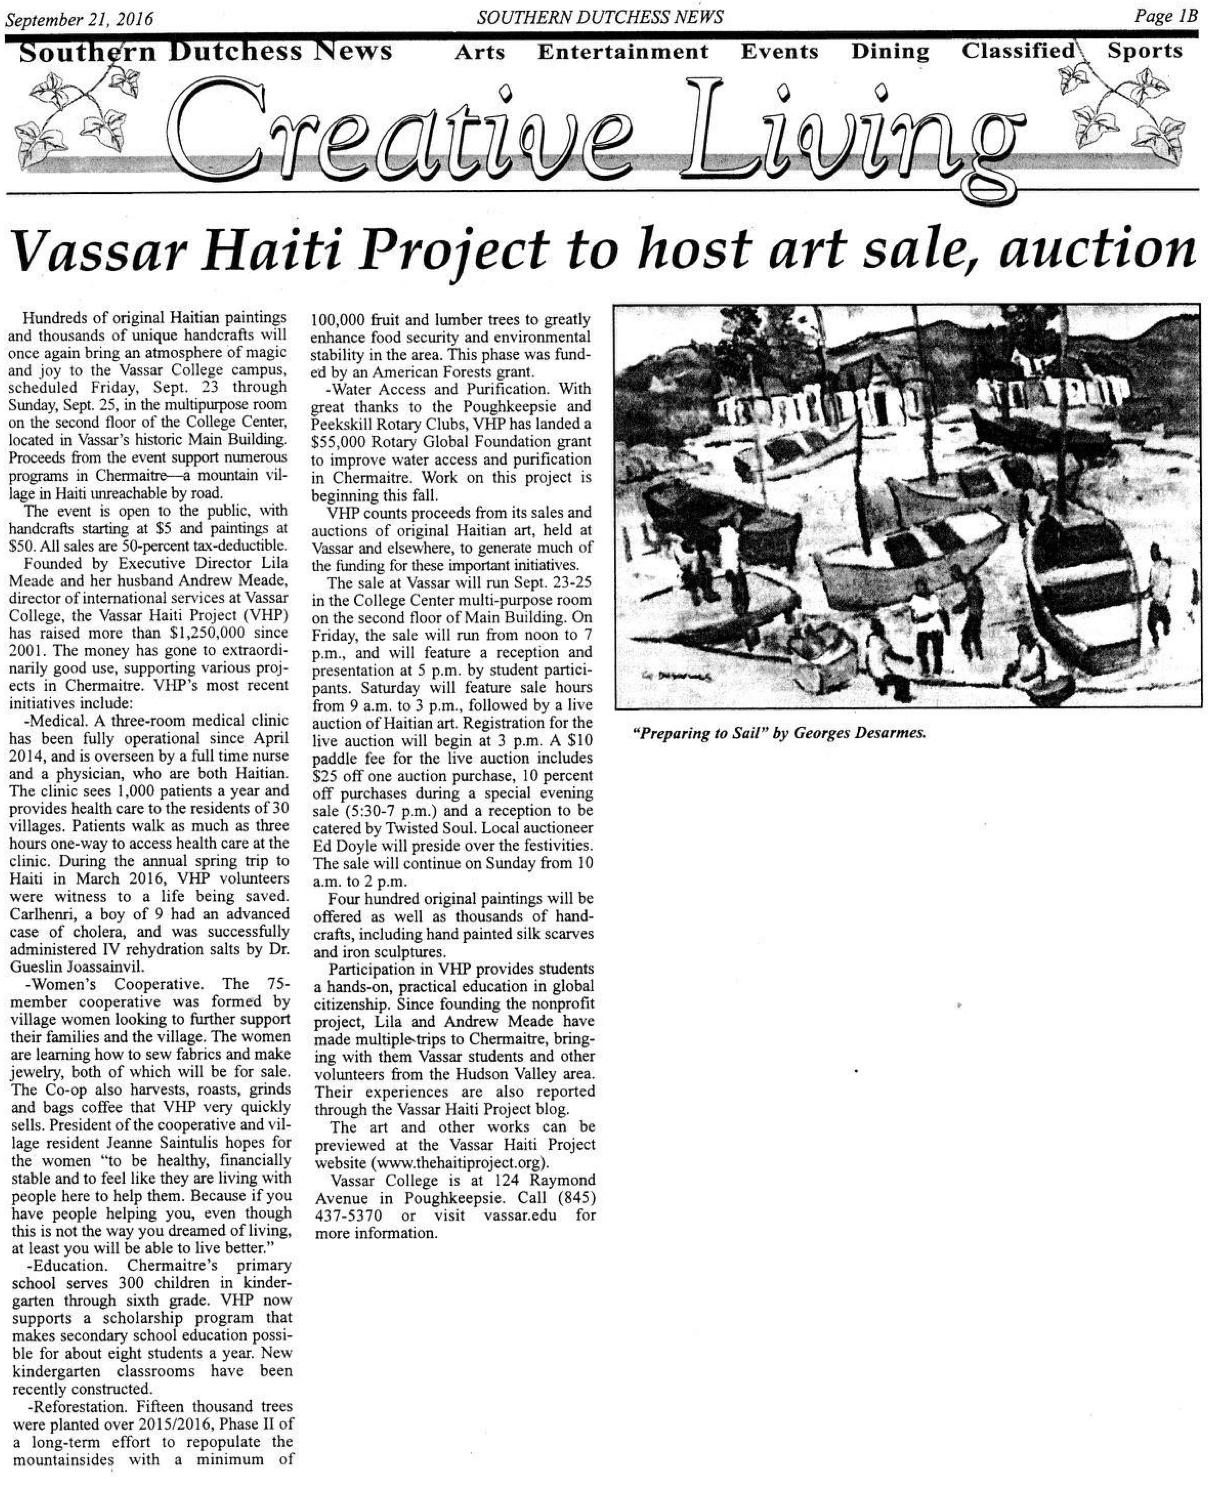 VHP Page 41.jpg